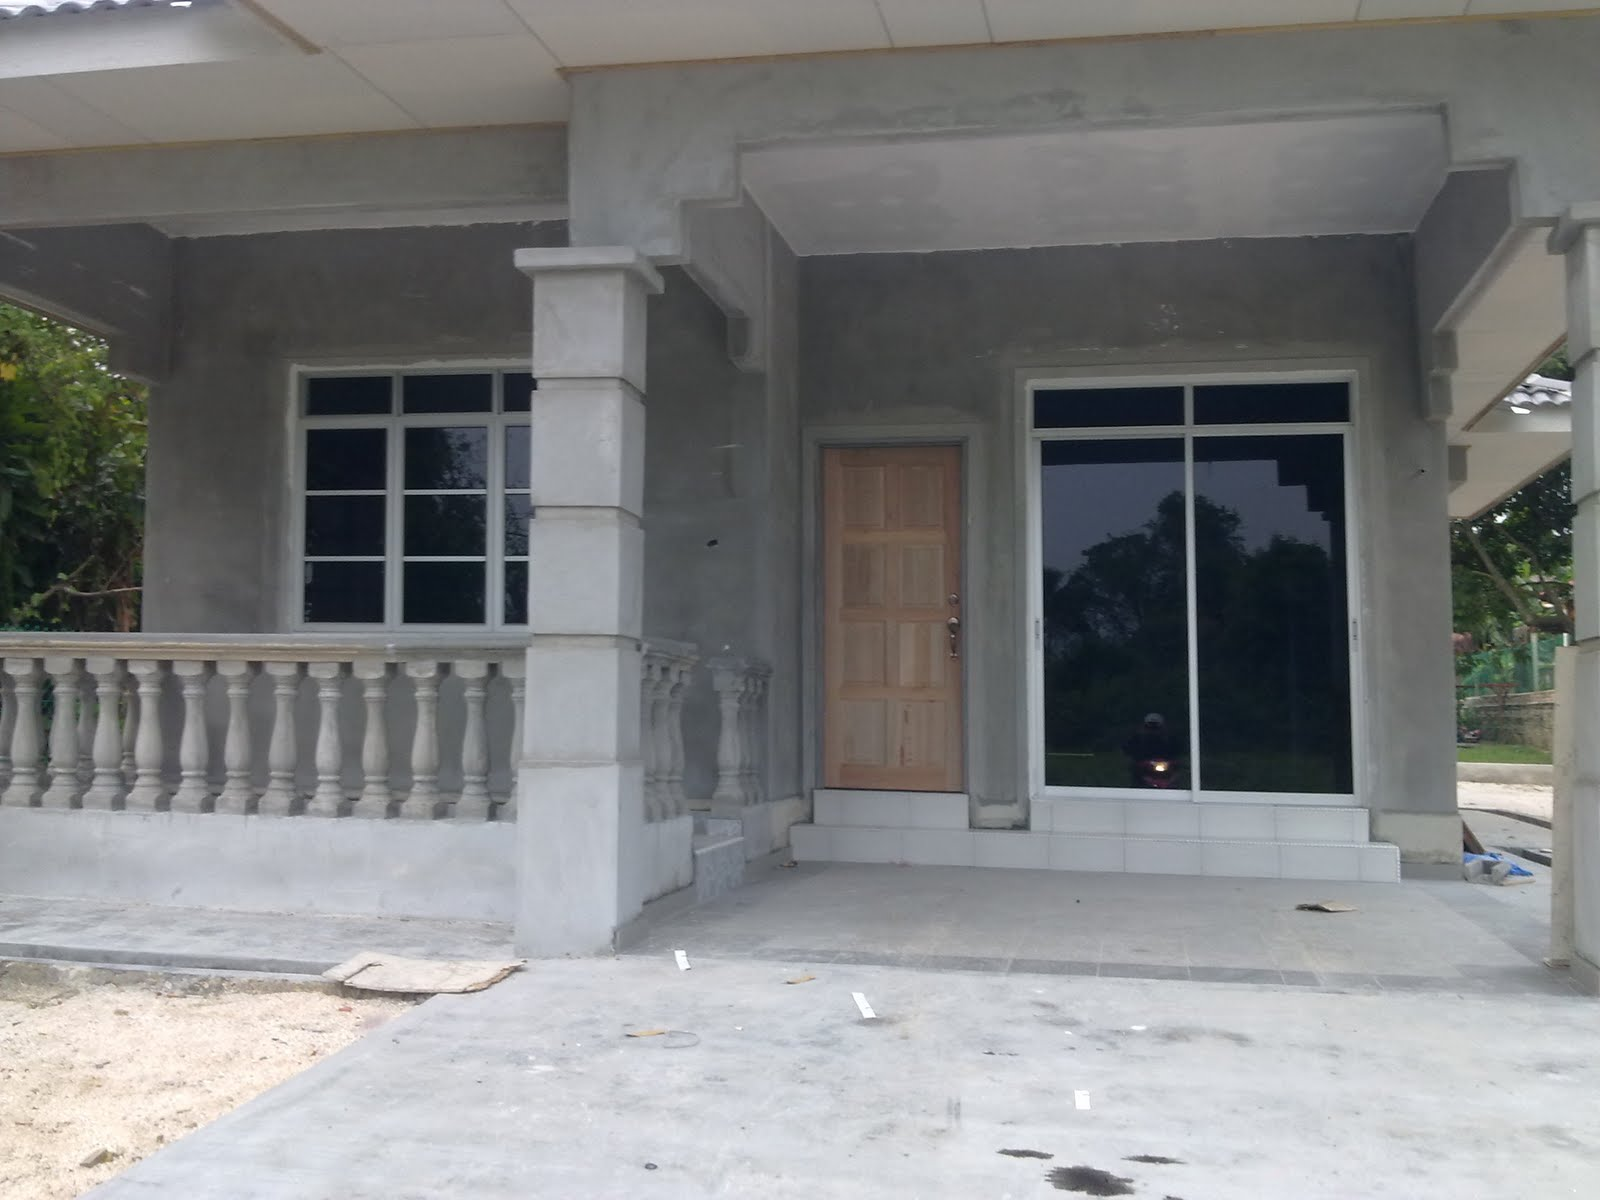 bina rumah bina rumah bina rumah bina rumah bina rumah bina rumah pada